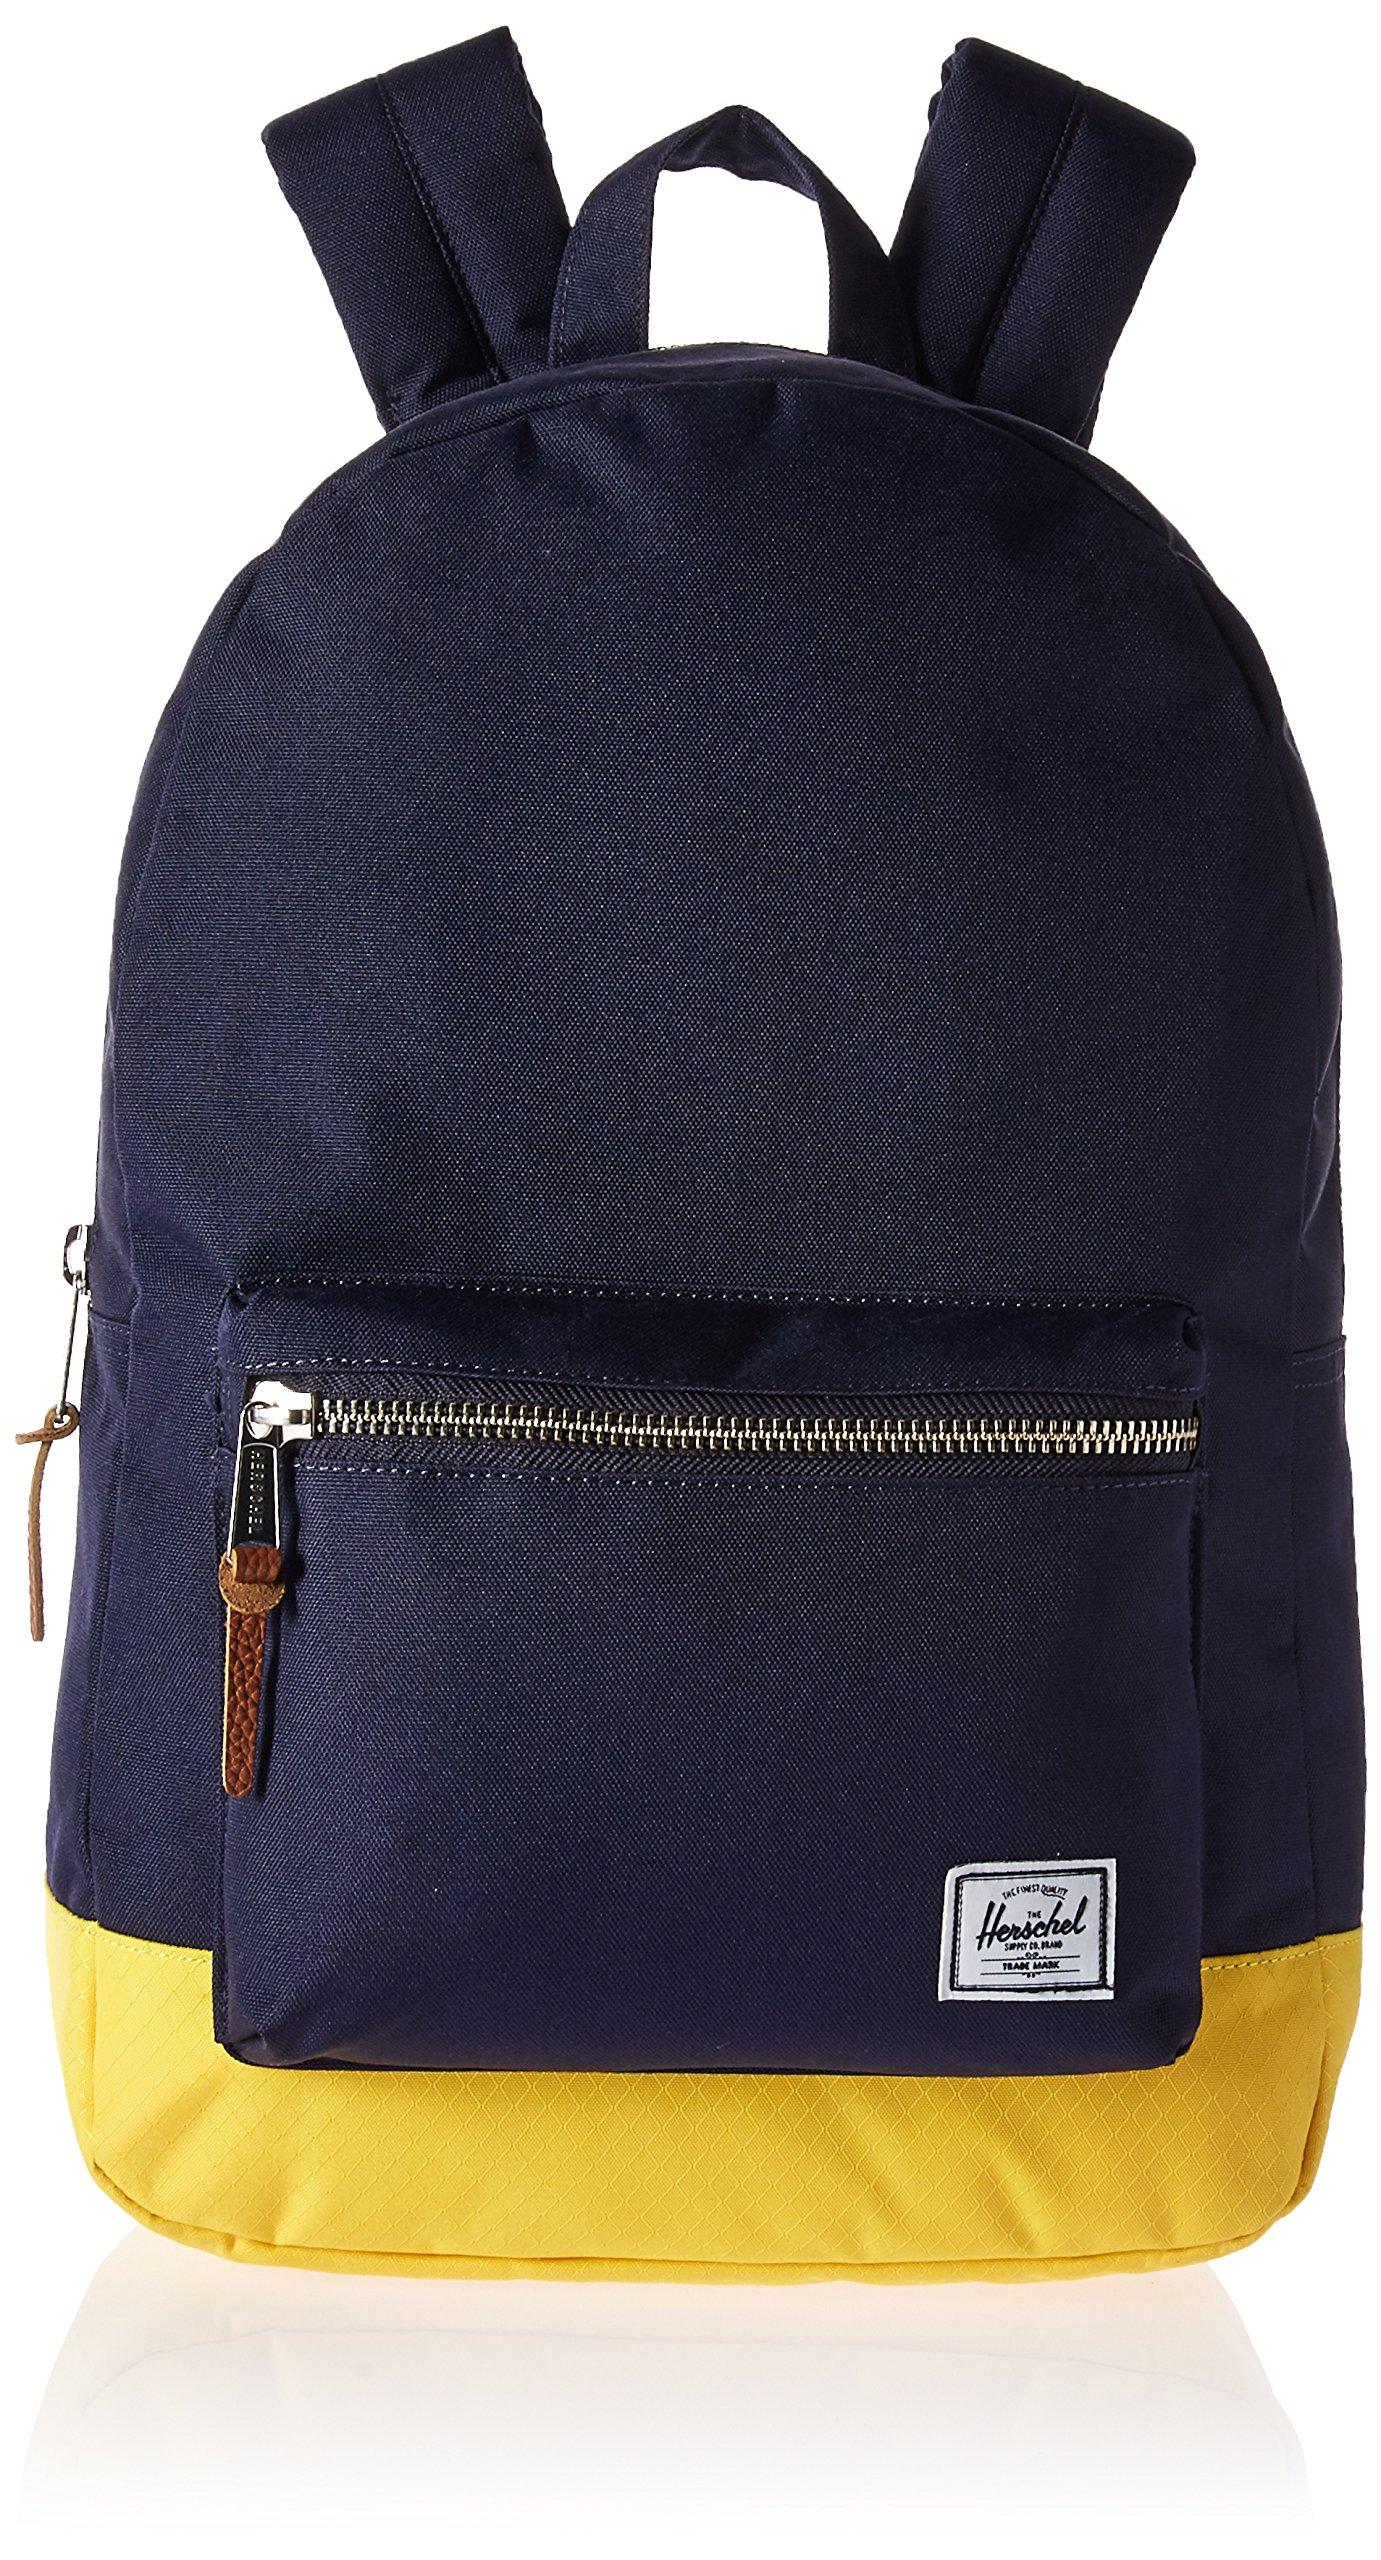 Herschel Supply Co. Settlement Backpack, Peacoat/Cyber Yellow